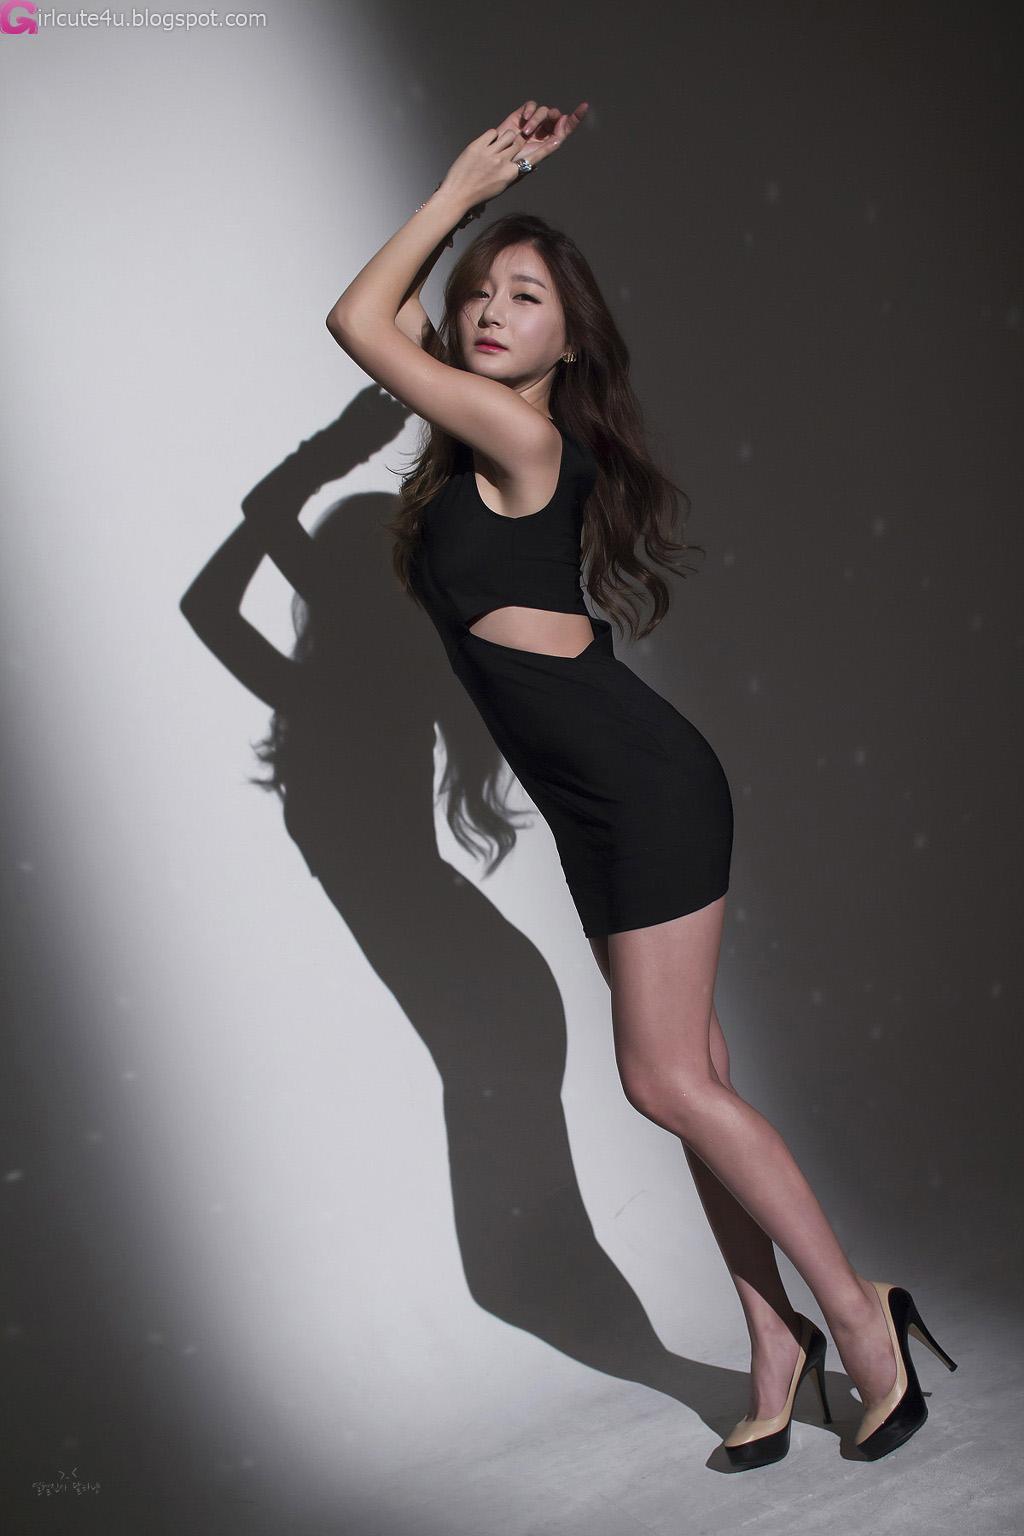 xxx nude girls: Han Ga Eun - White Mini Dress